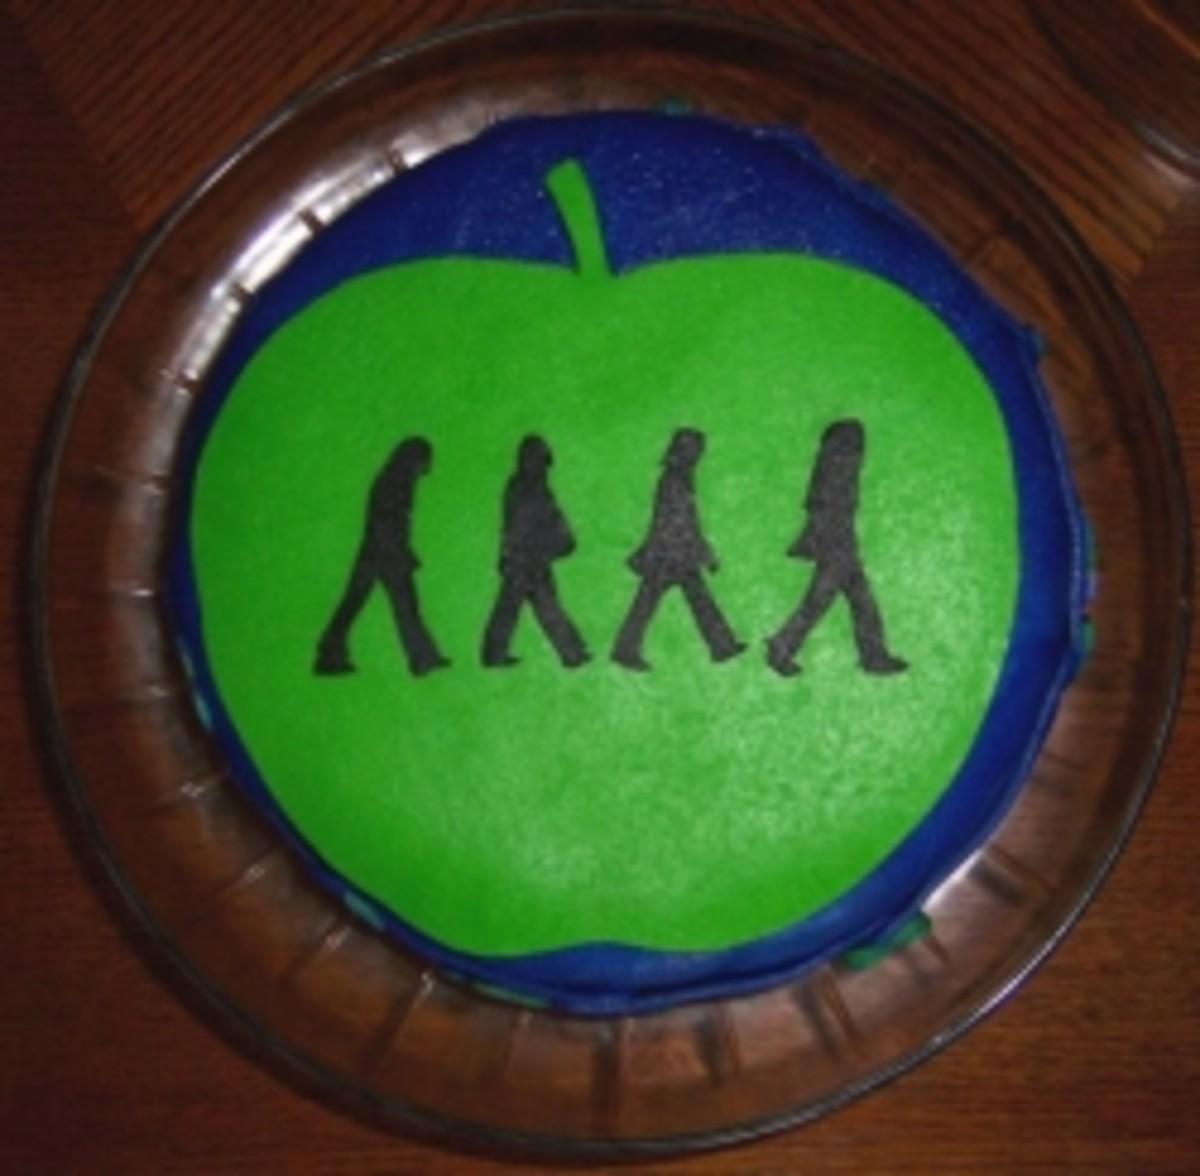 Beatles Abbey Road Fondant Cake I made for my partner's 40th birthday.